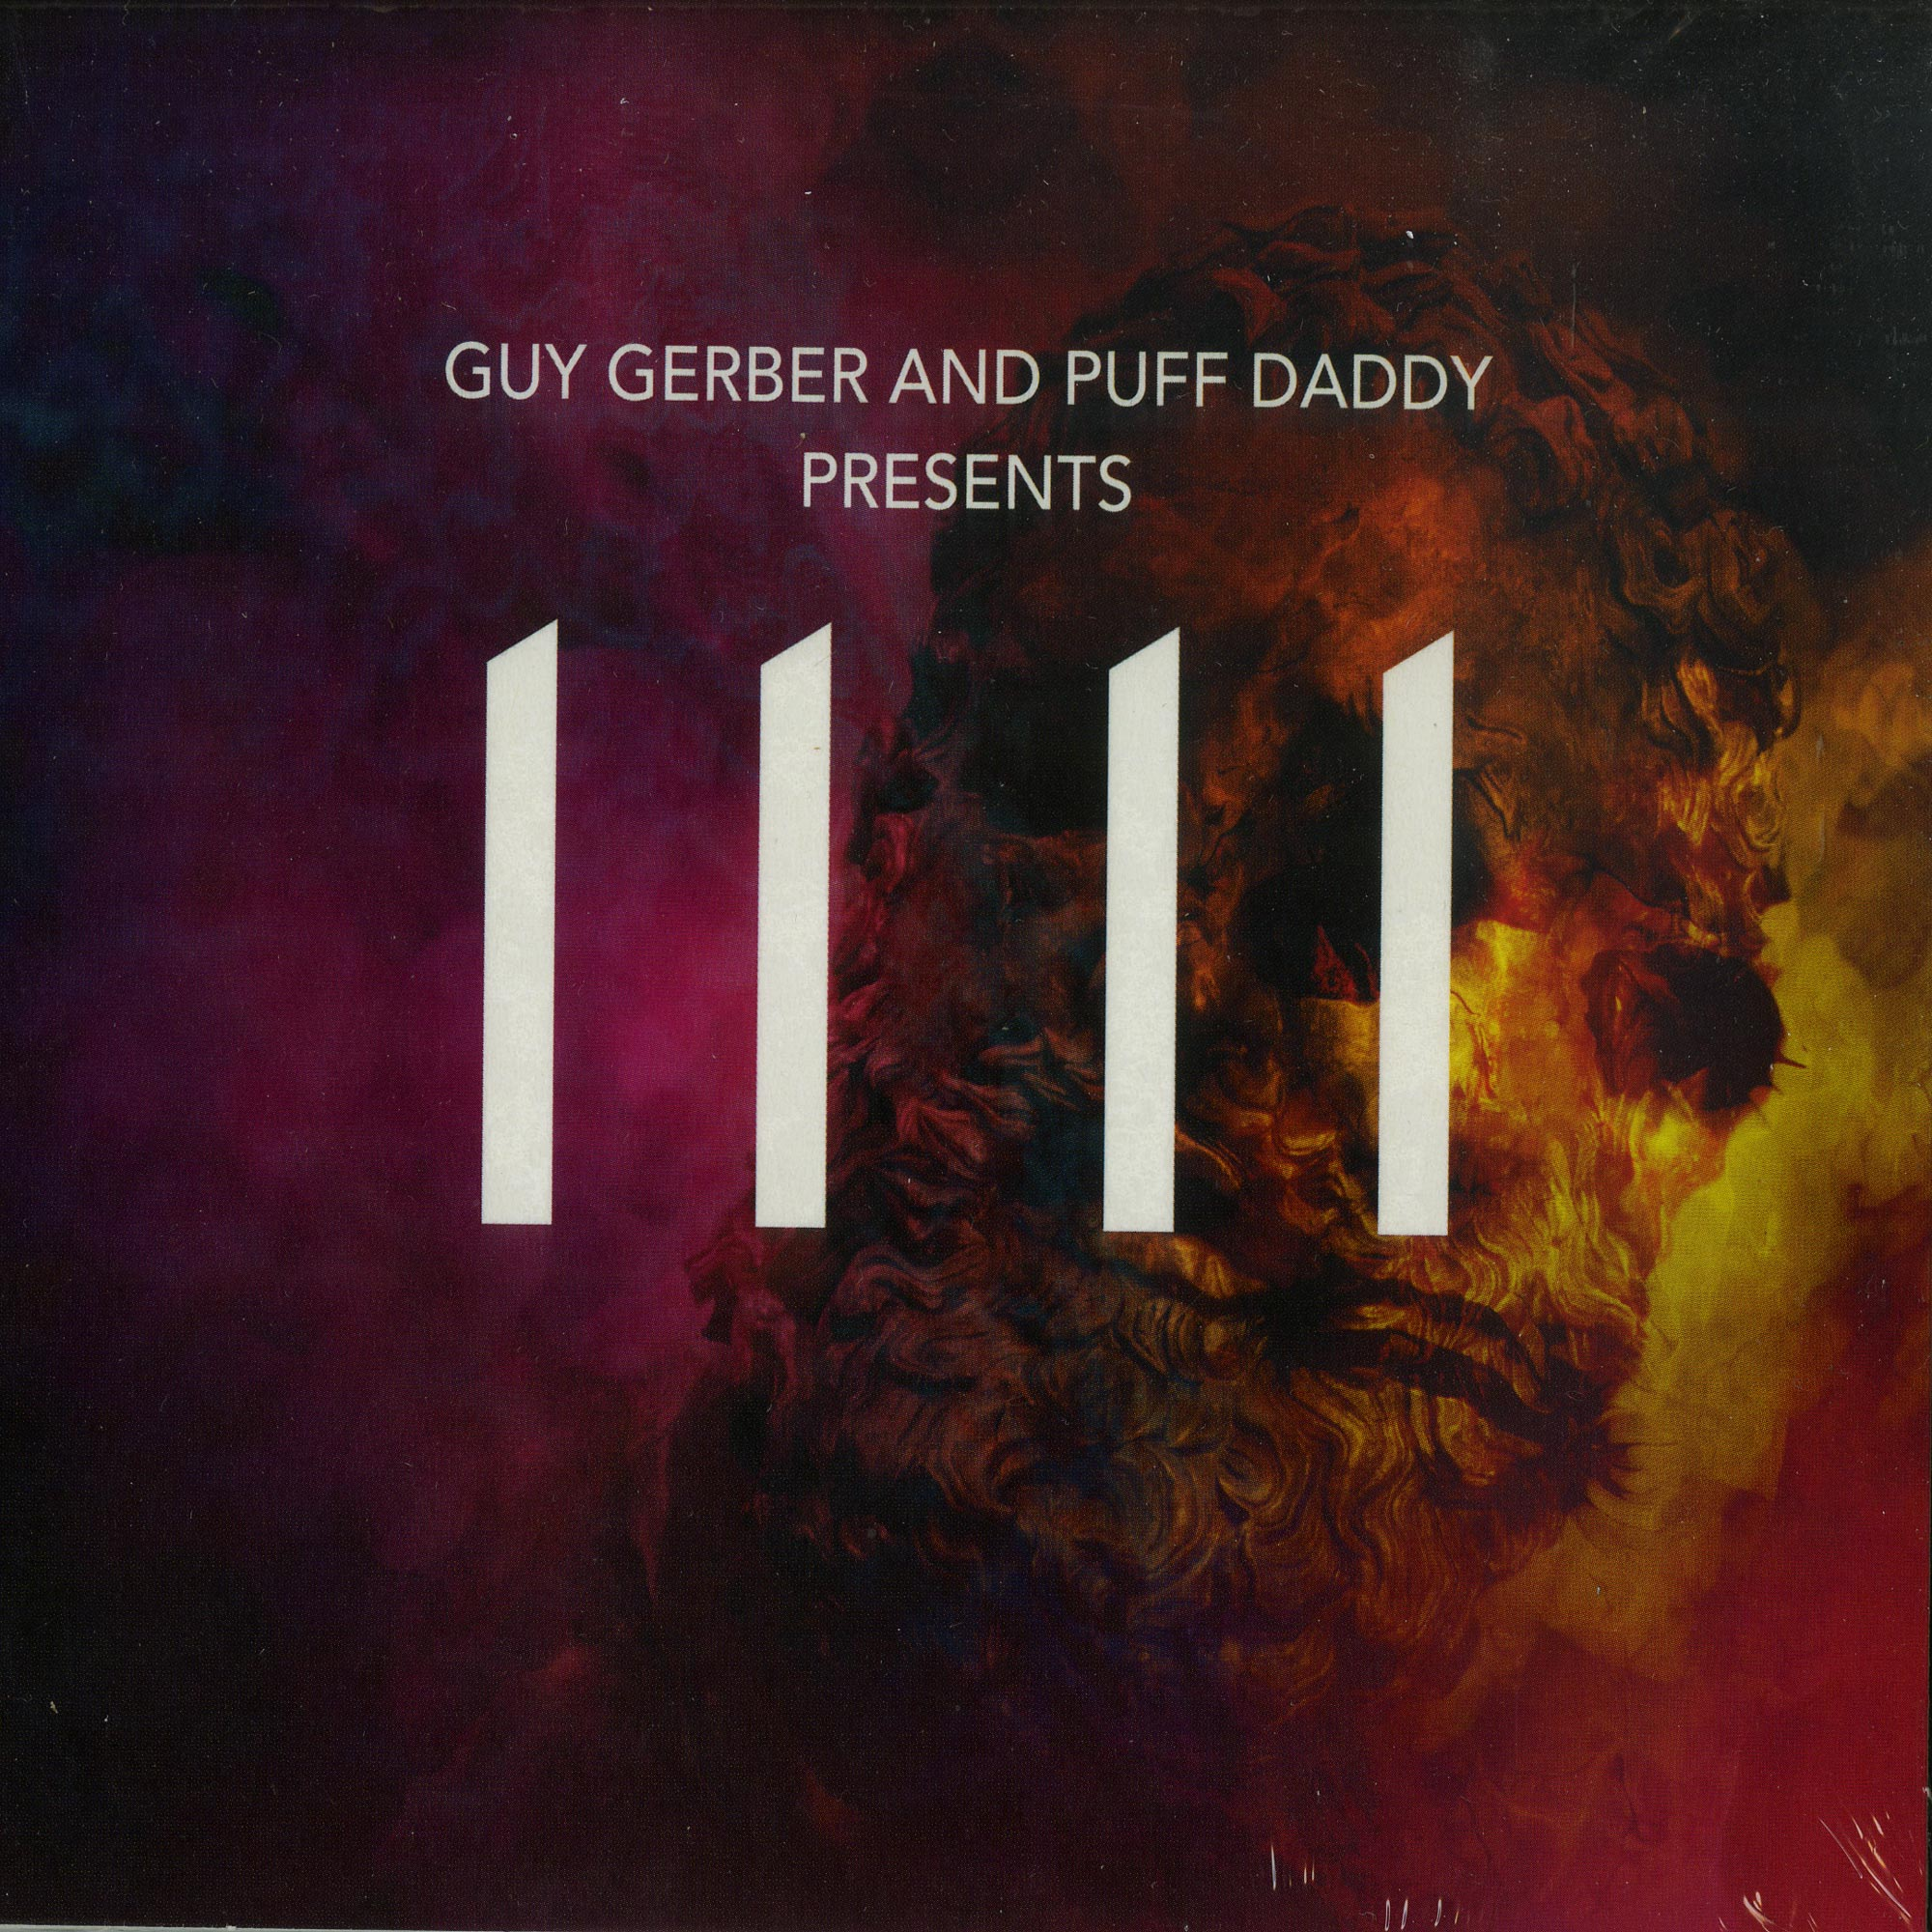 Guy Gerber & Puff Daddy - 11 11